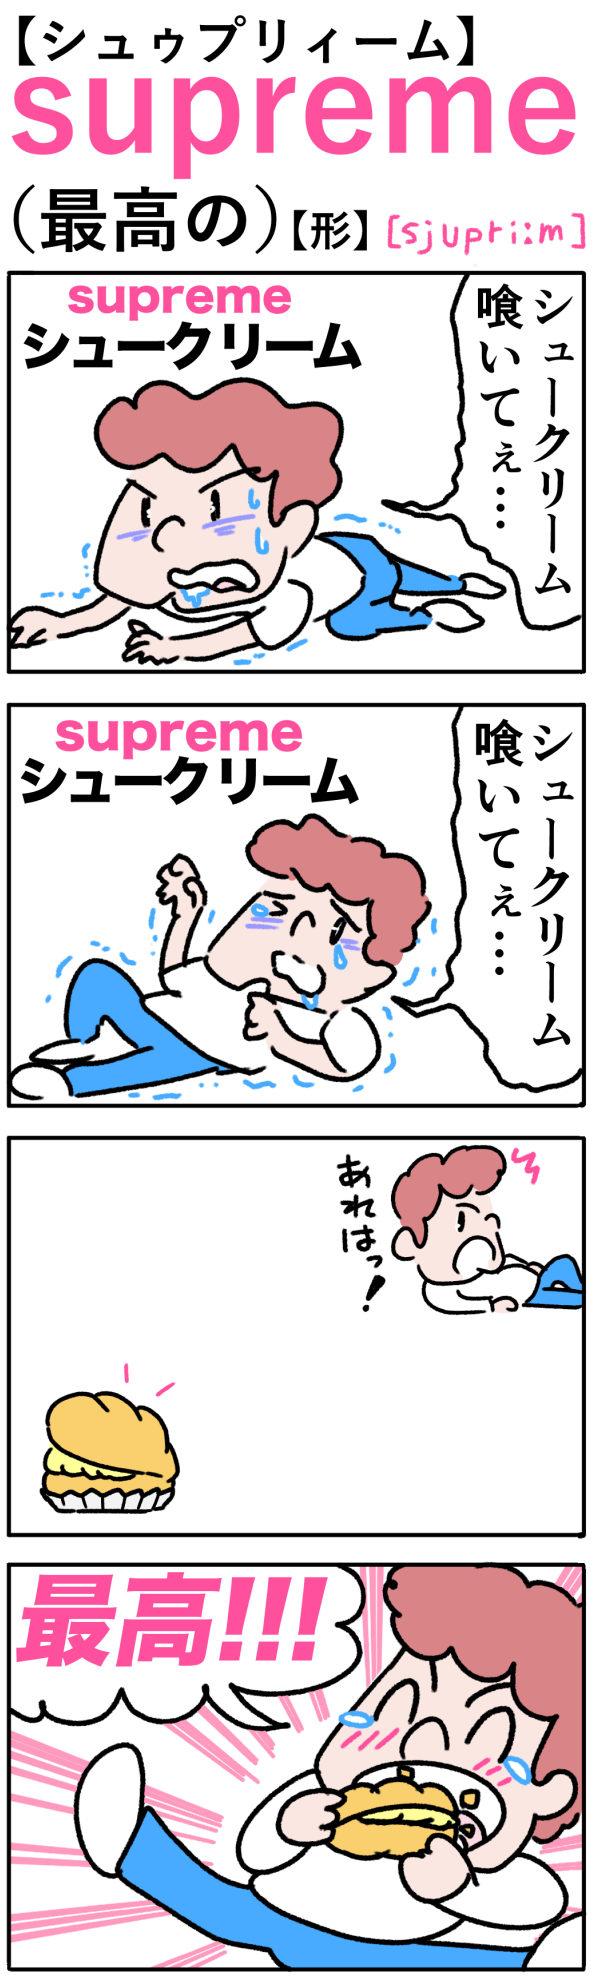 supreme(最高の)の語呂合わせ英単語